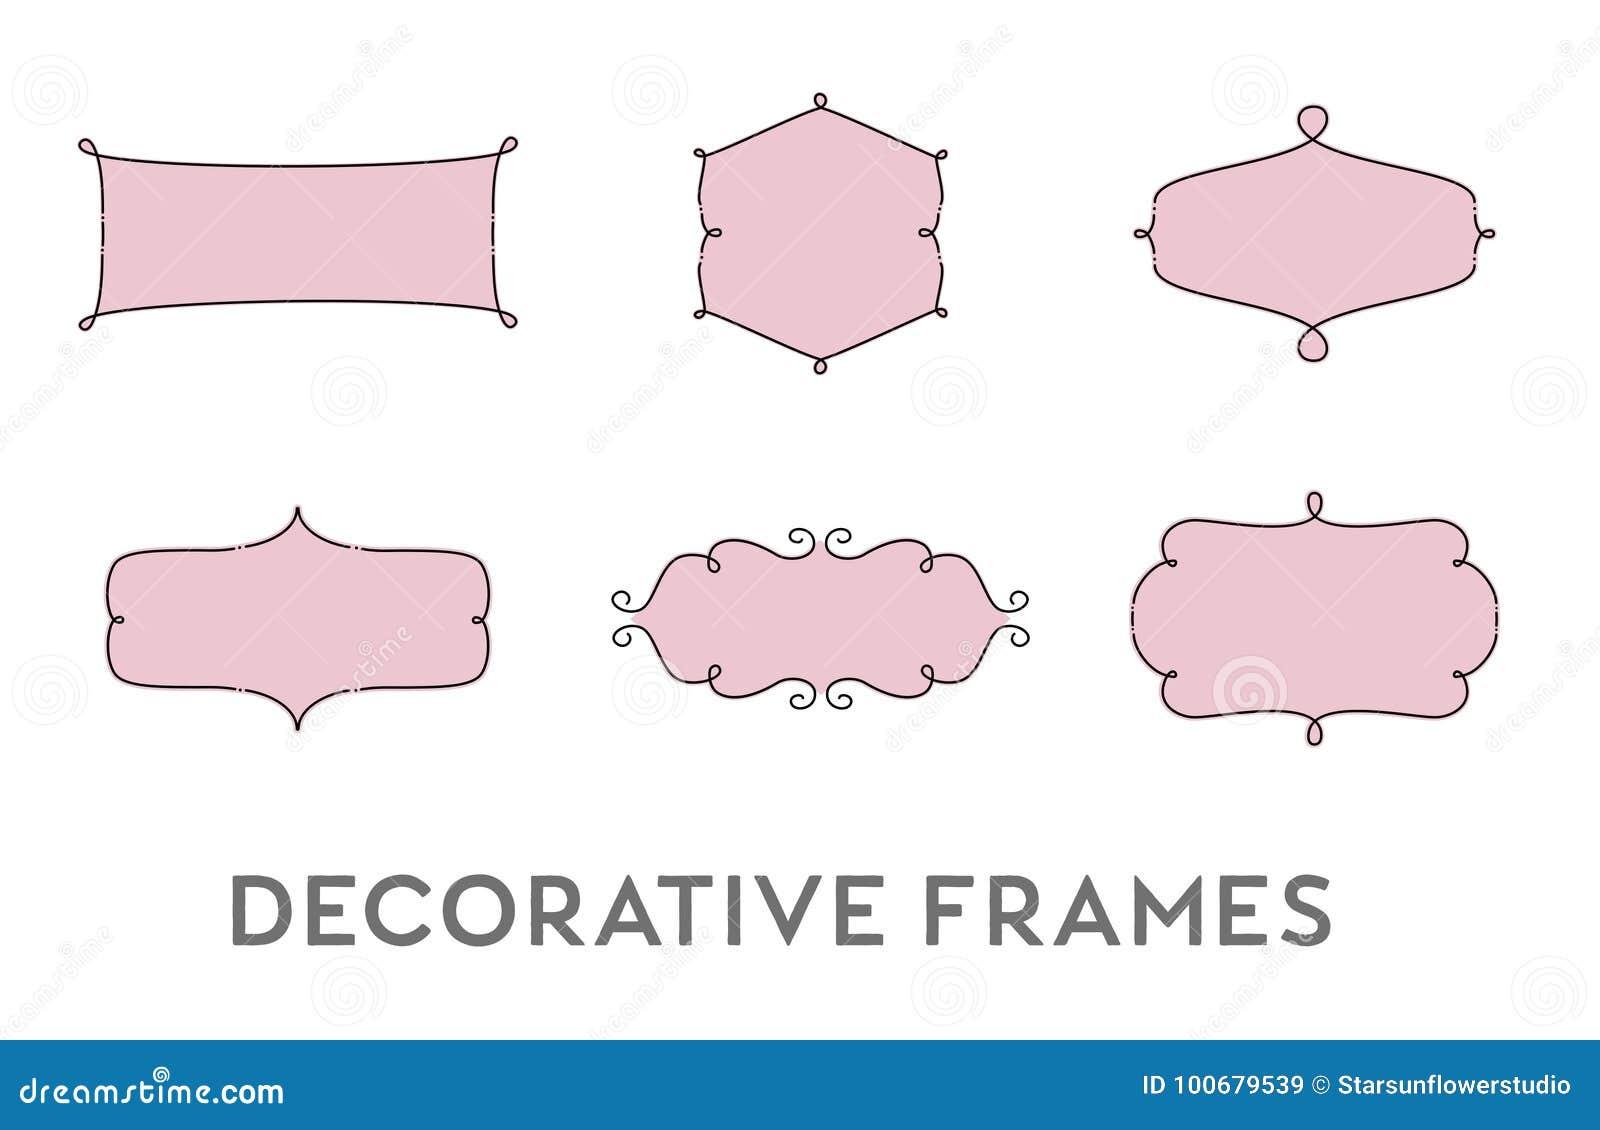 Decorative Frames Vector Set Stock Vector - Illustration of ...